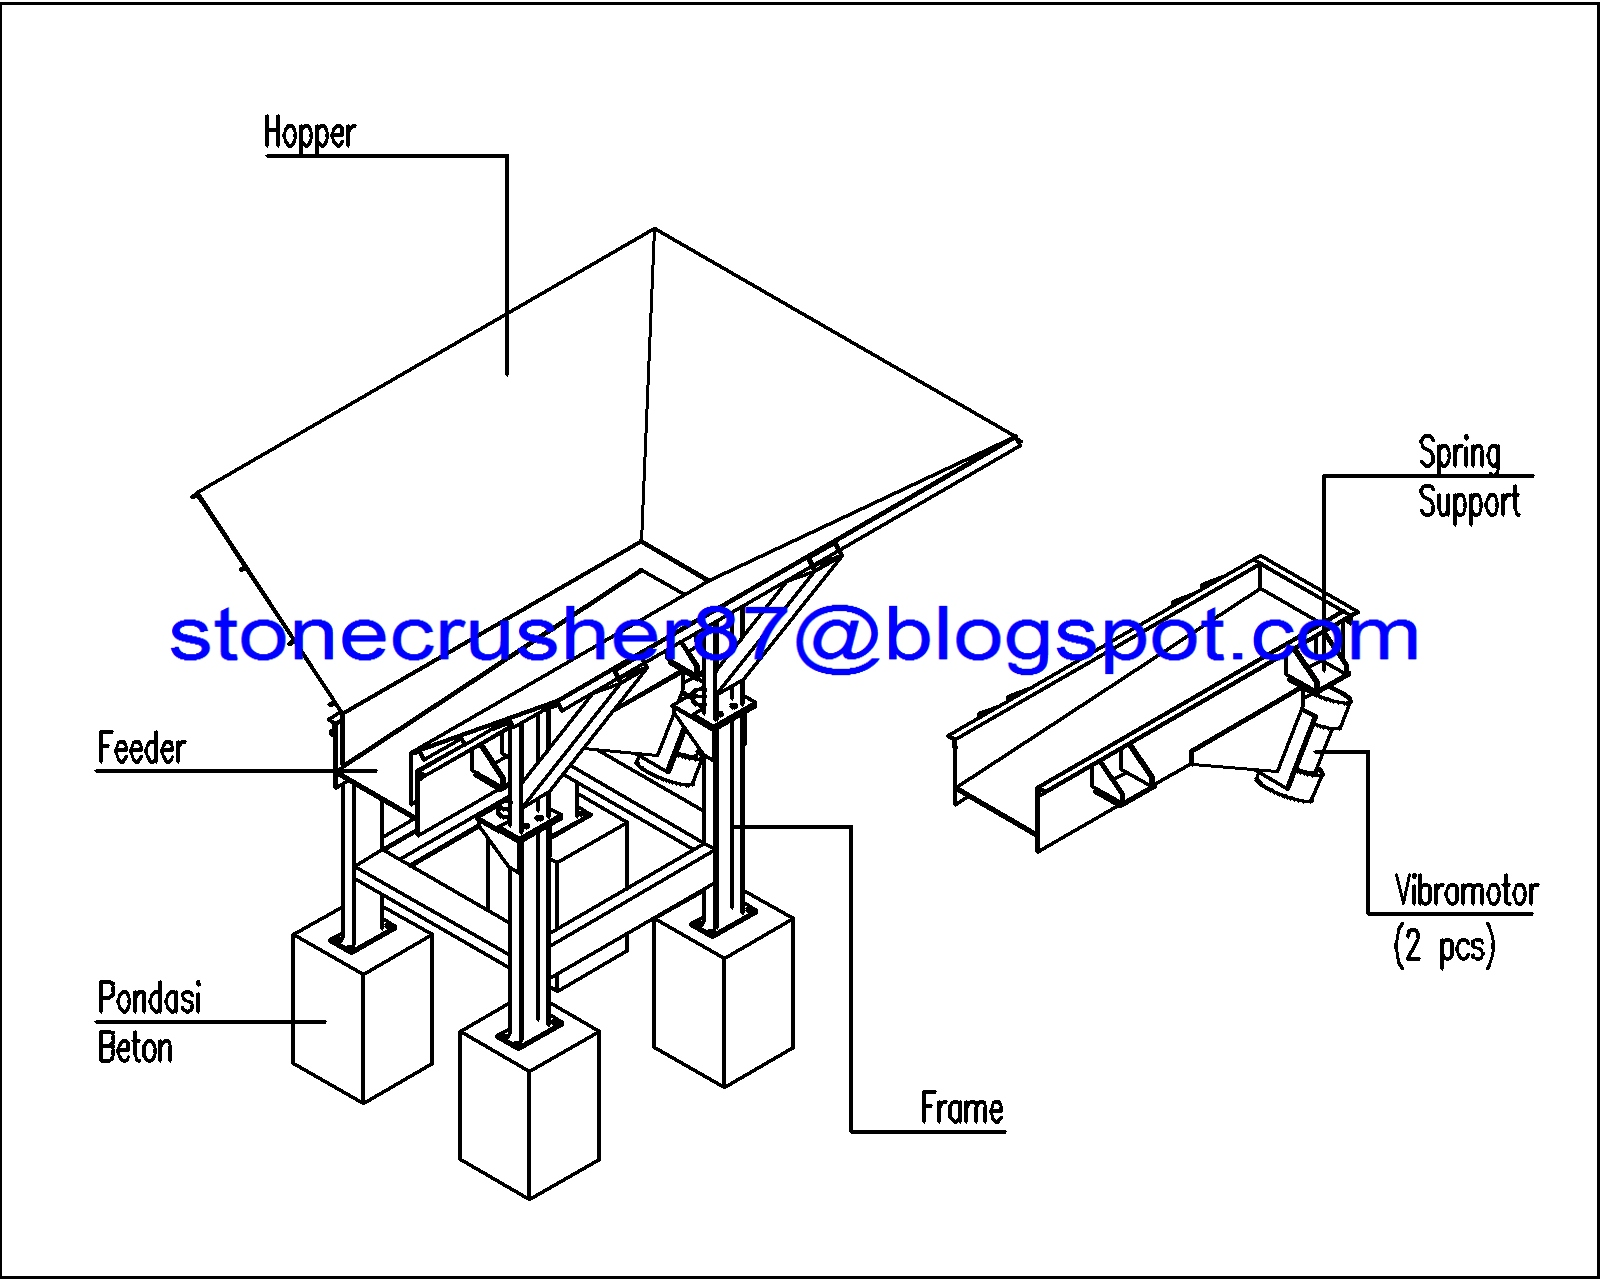 Unit Pengumpan Feeding Vibratory Feeder Jual Stone